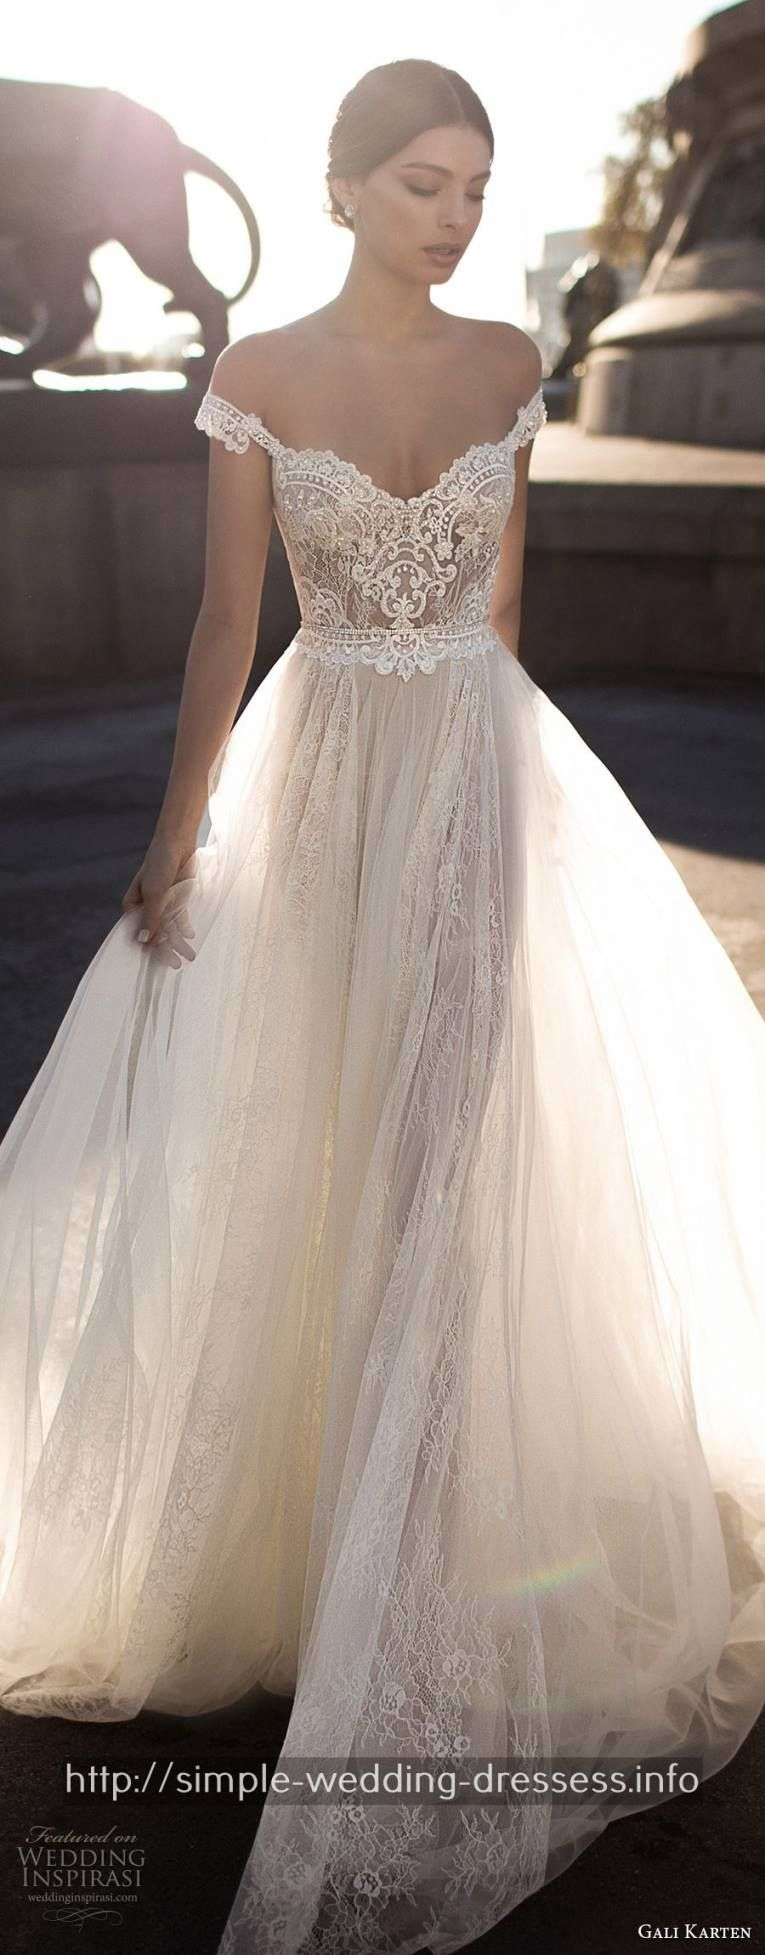 Short wedding dresses plus size  Rustic Wedding Dresses Plus Size  Short wedding dresses